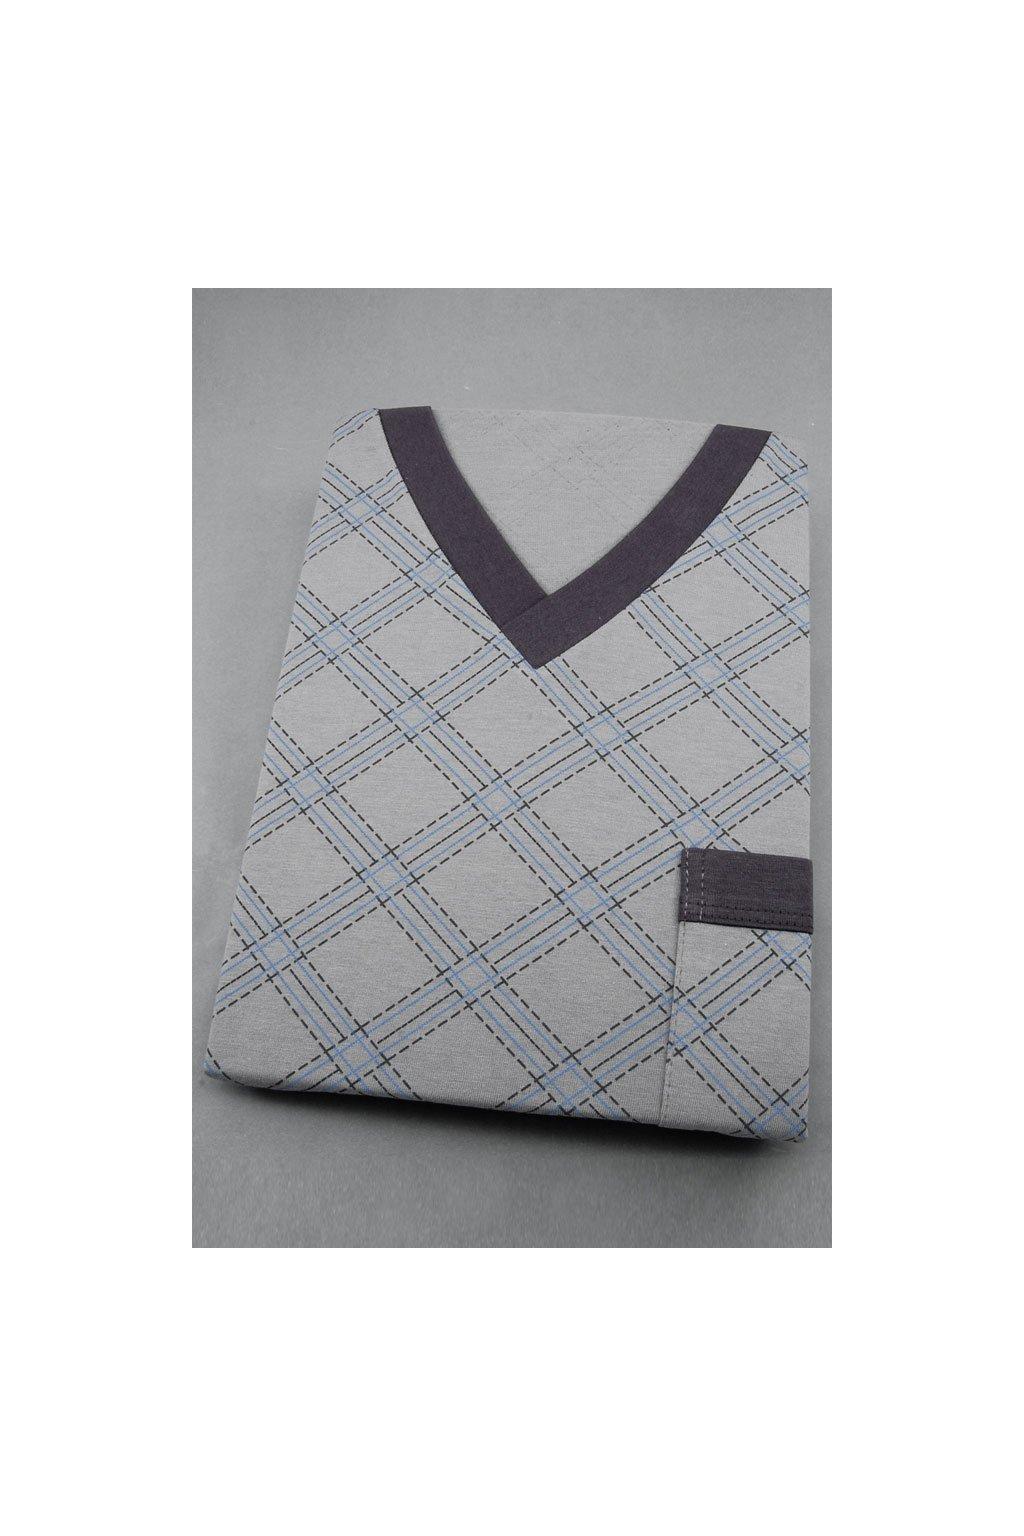 Pánské pyžamo s dlouhým rukávem, 204ERNESTd 779, šedá